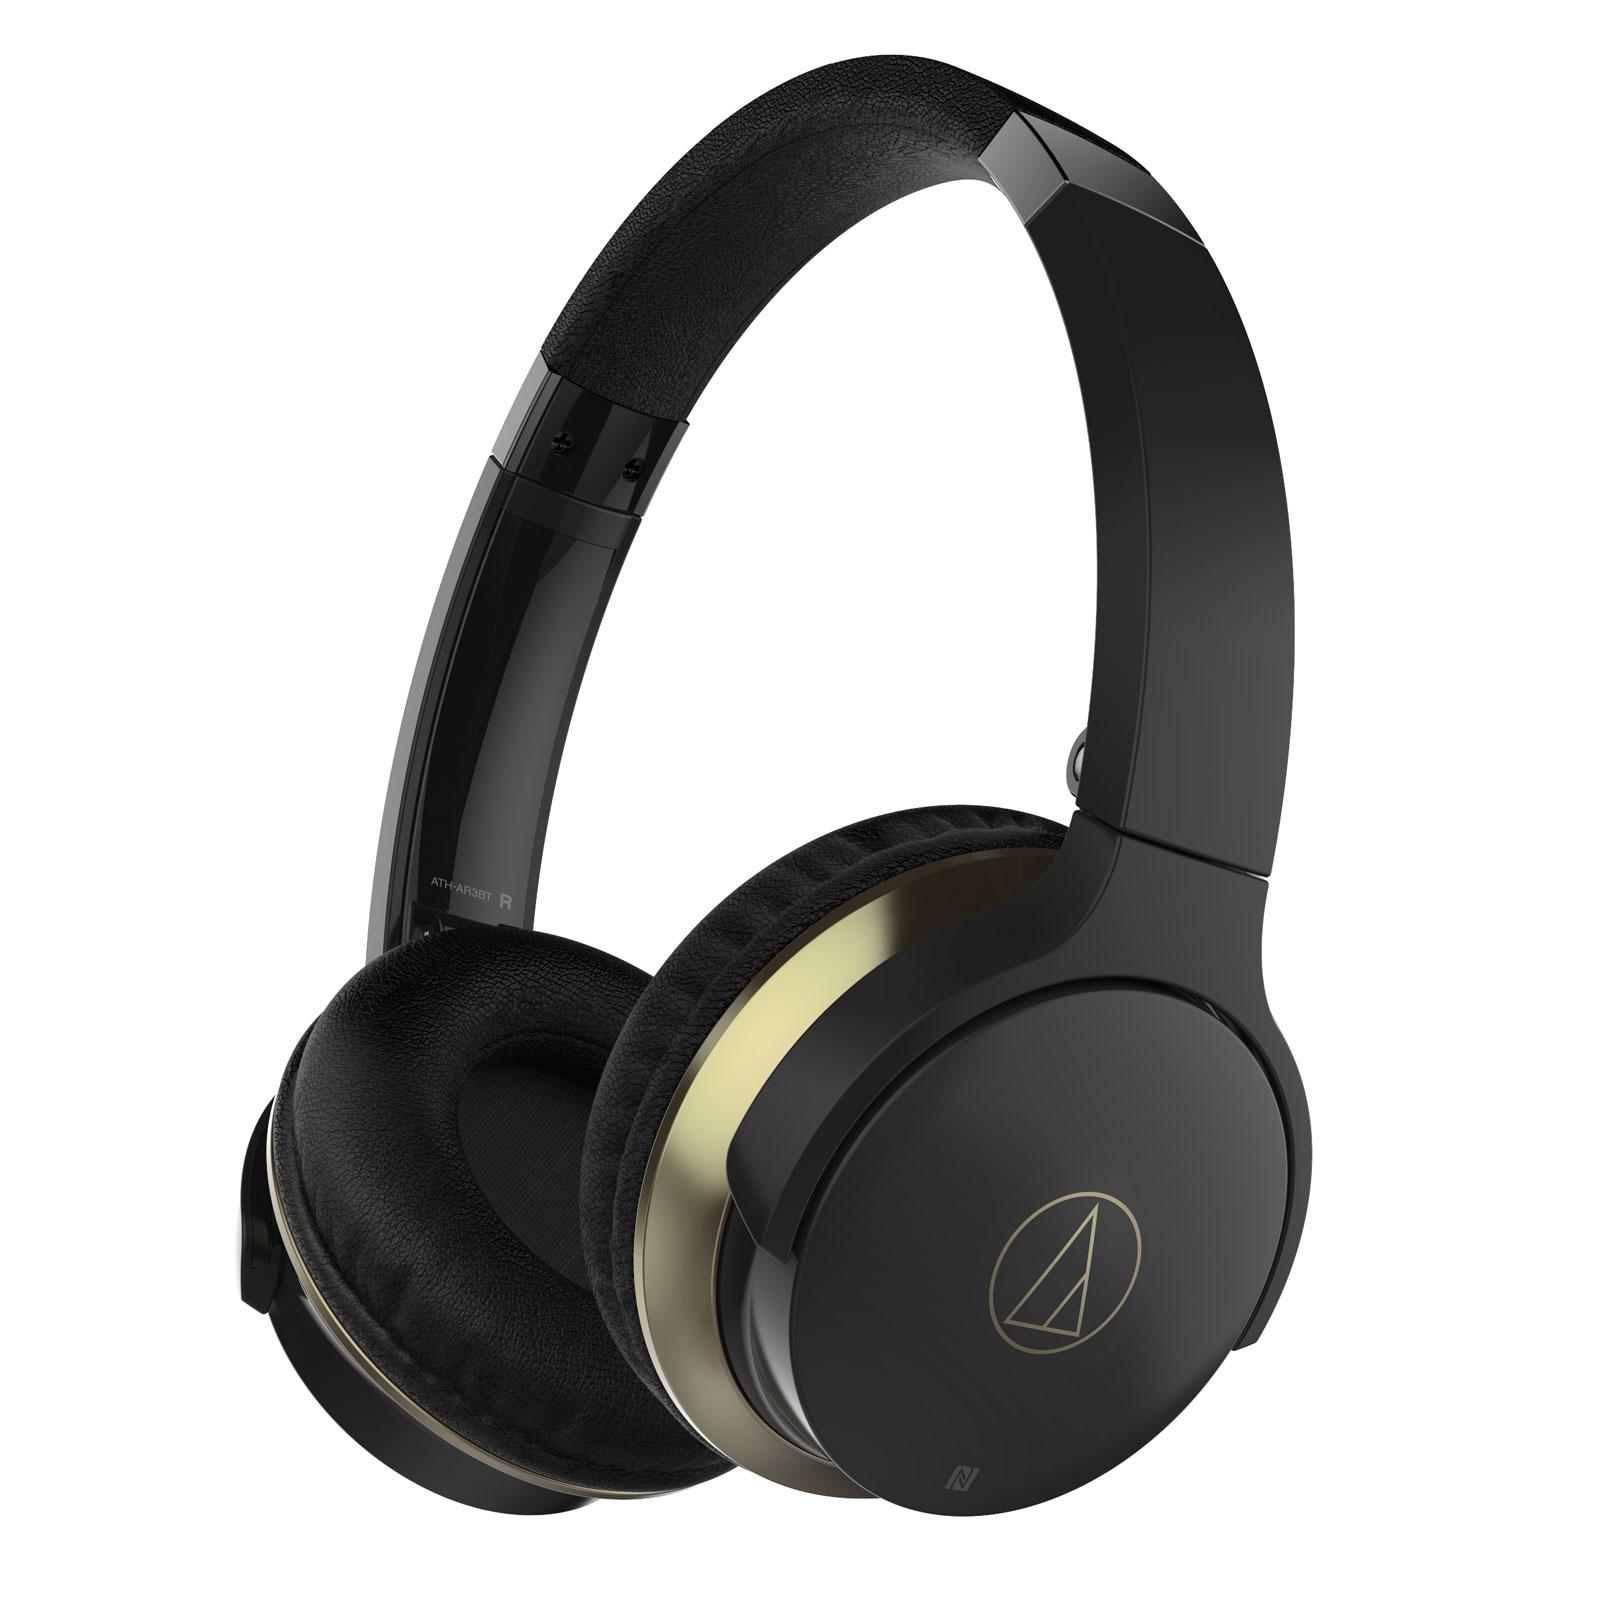 audio technica ath ar3bt noir casque audio technica sur ldlc. Black Bedroom Furniture Sets. Home Design Ideas